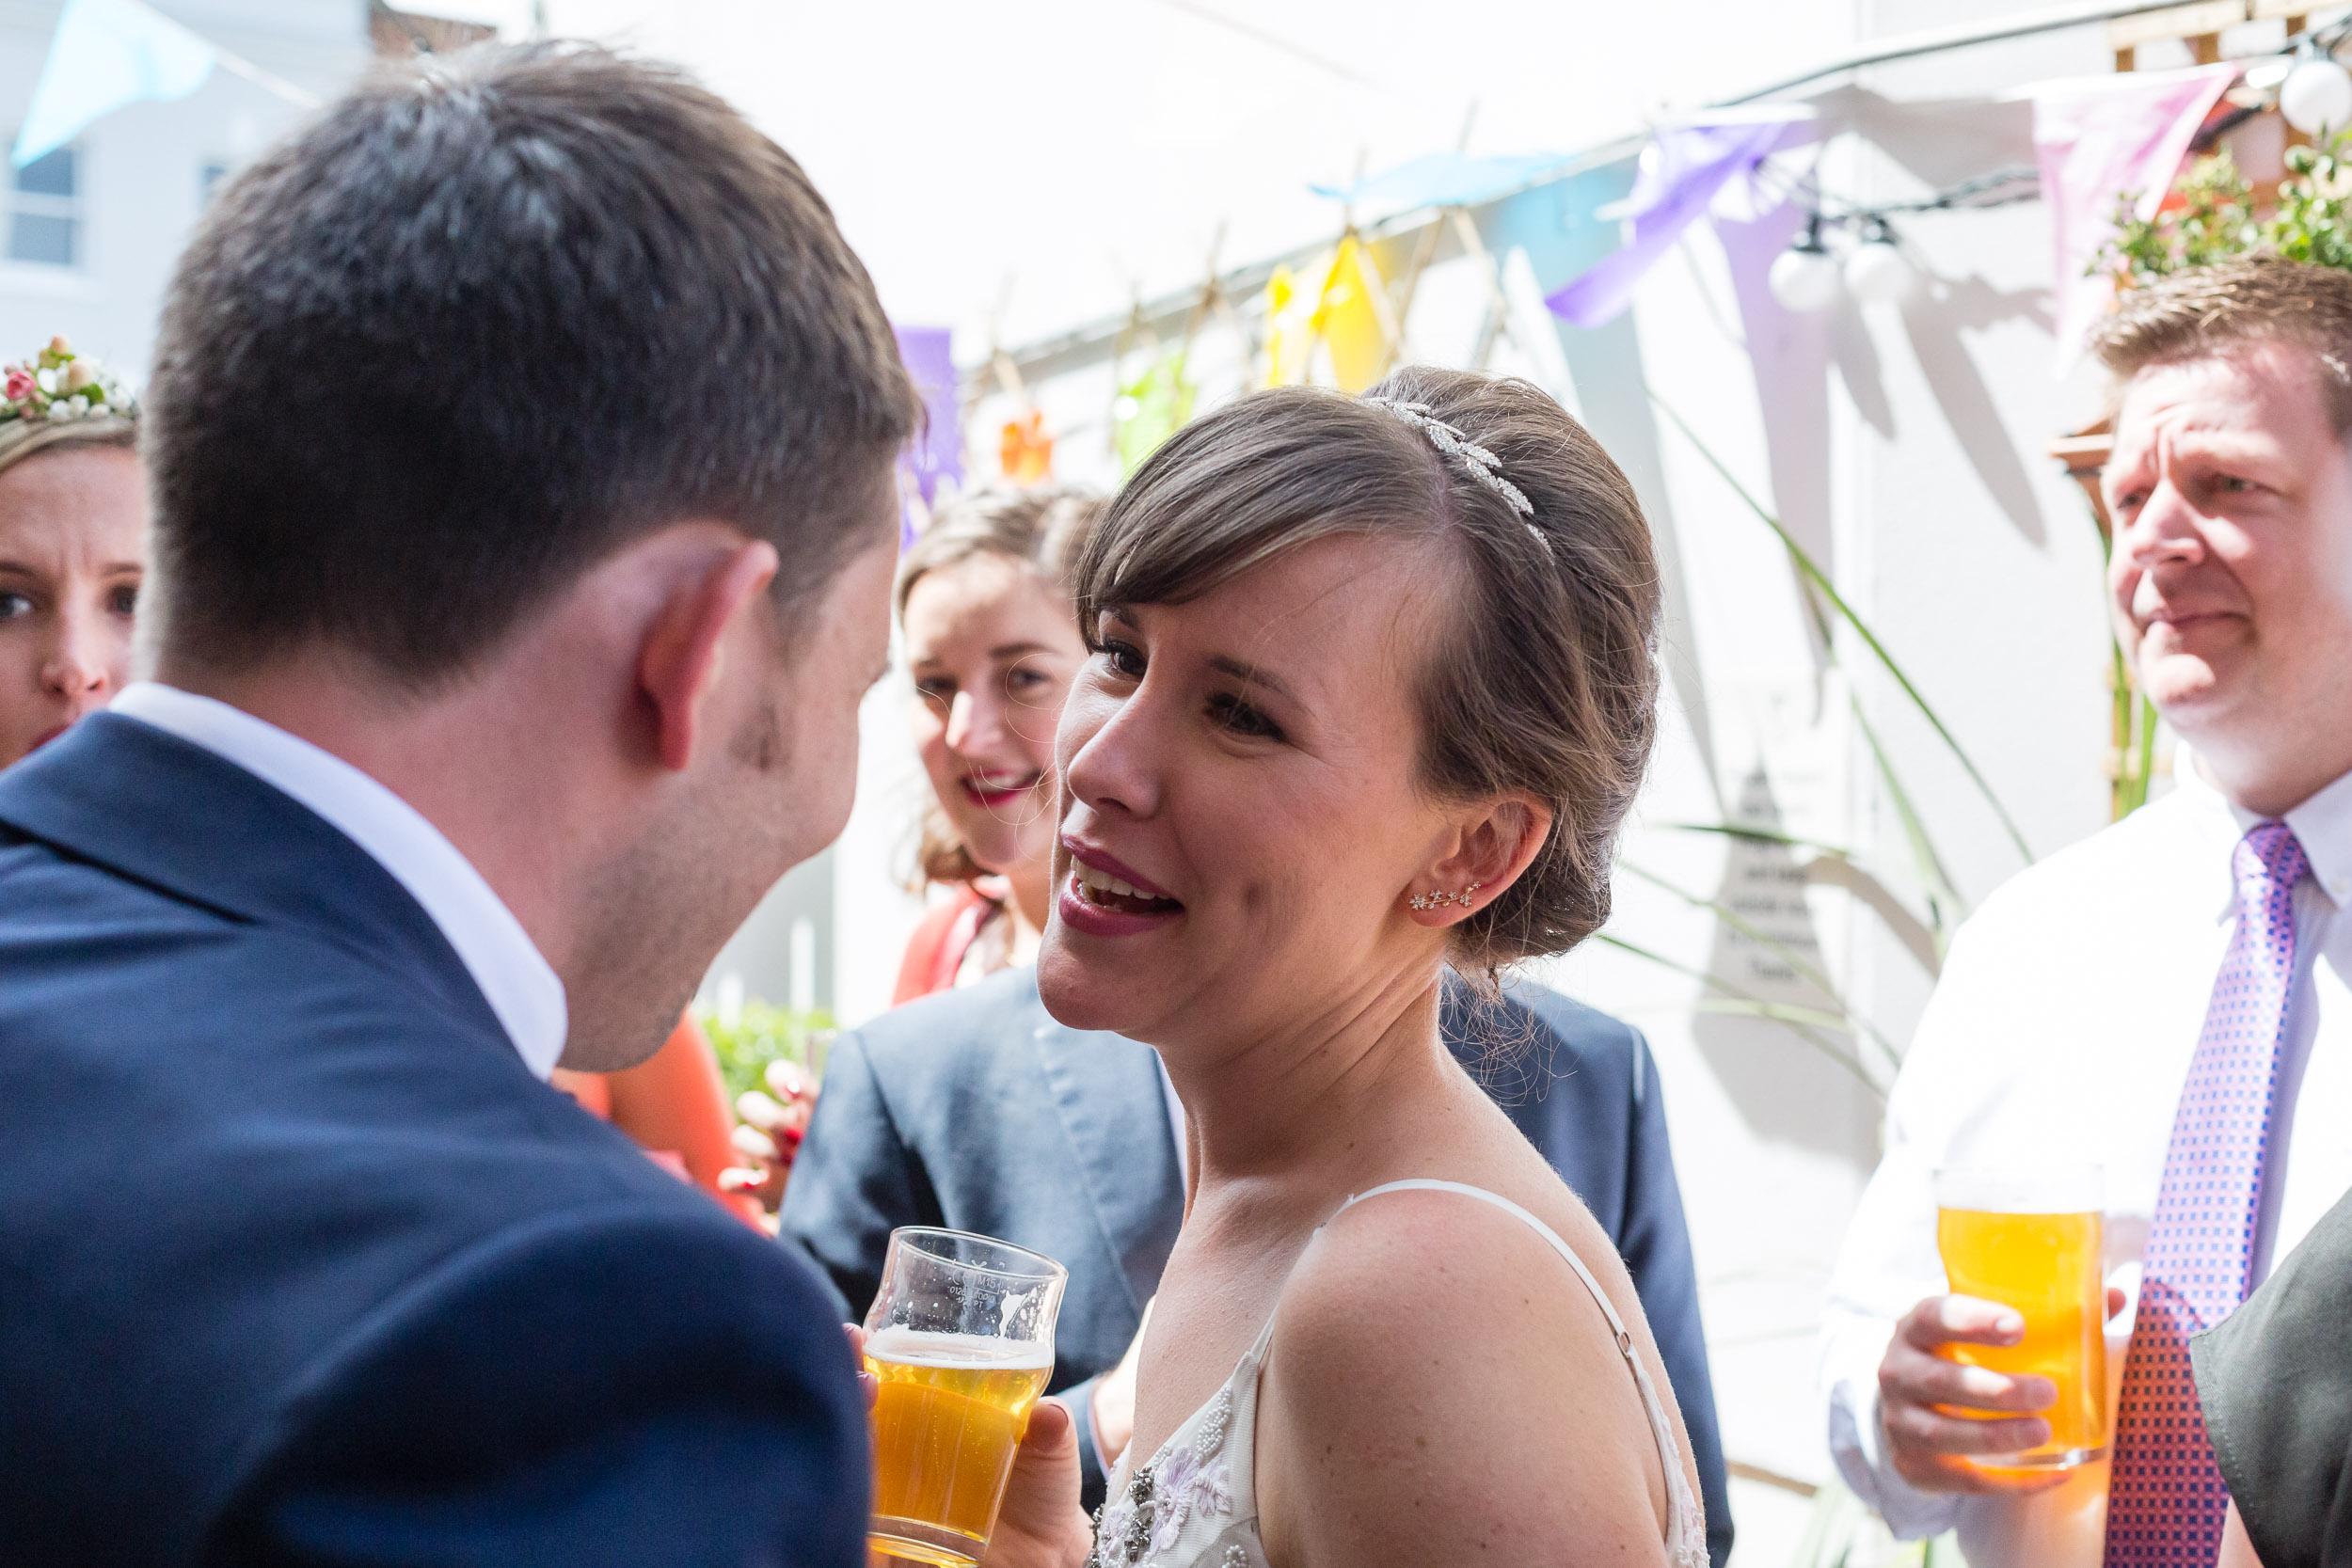 brockwell-lido-brixton-herne-hill-wedding-063.jpg